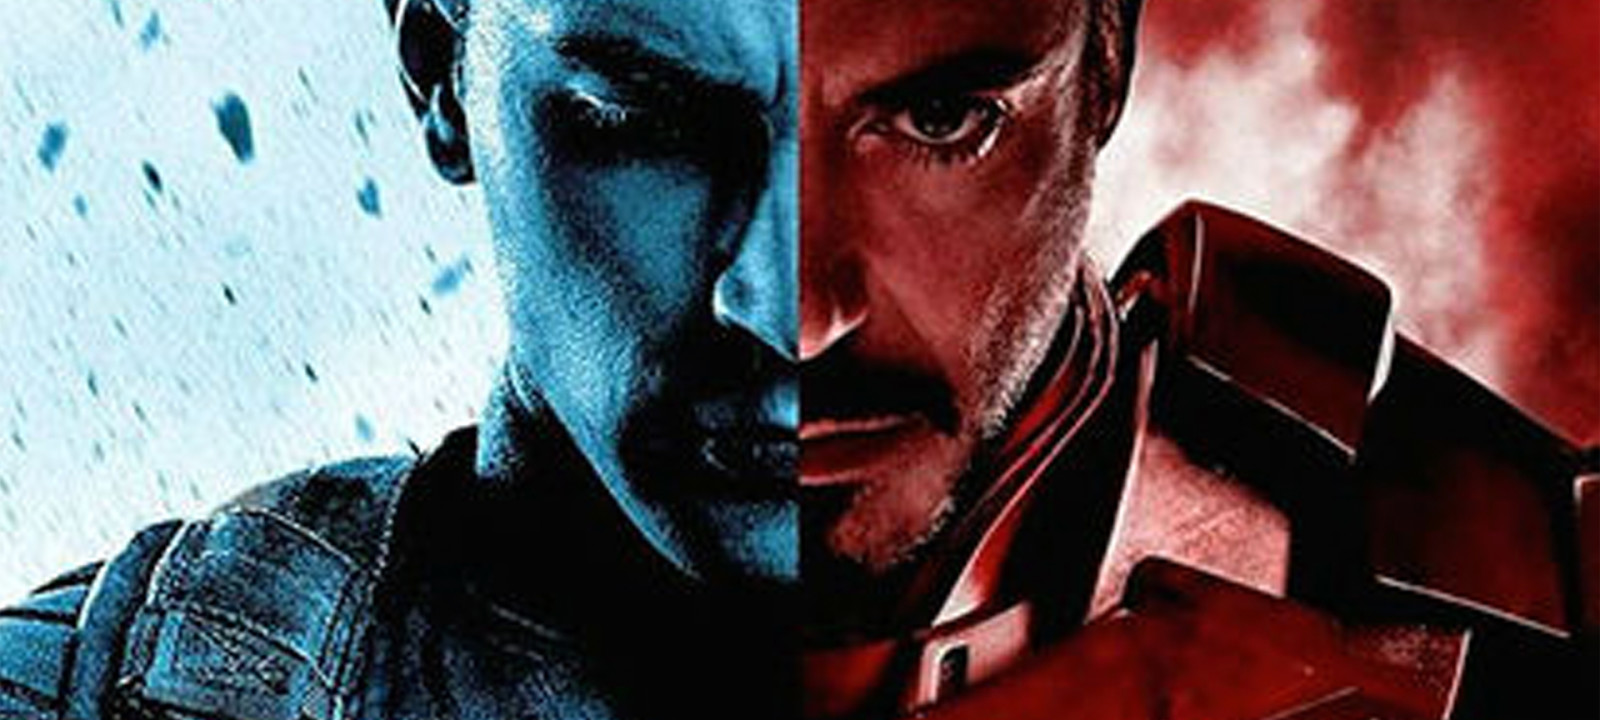 Watch Captain America Civil War Trailer In Lego Anglophenia